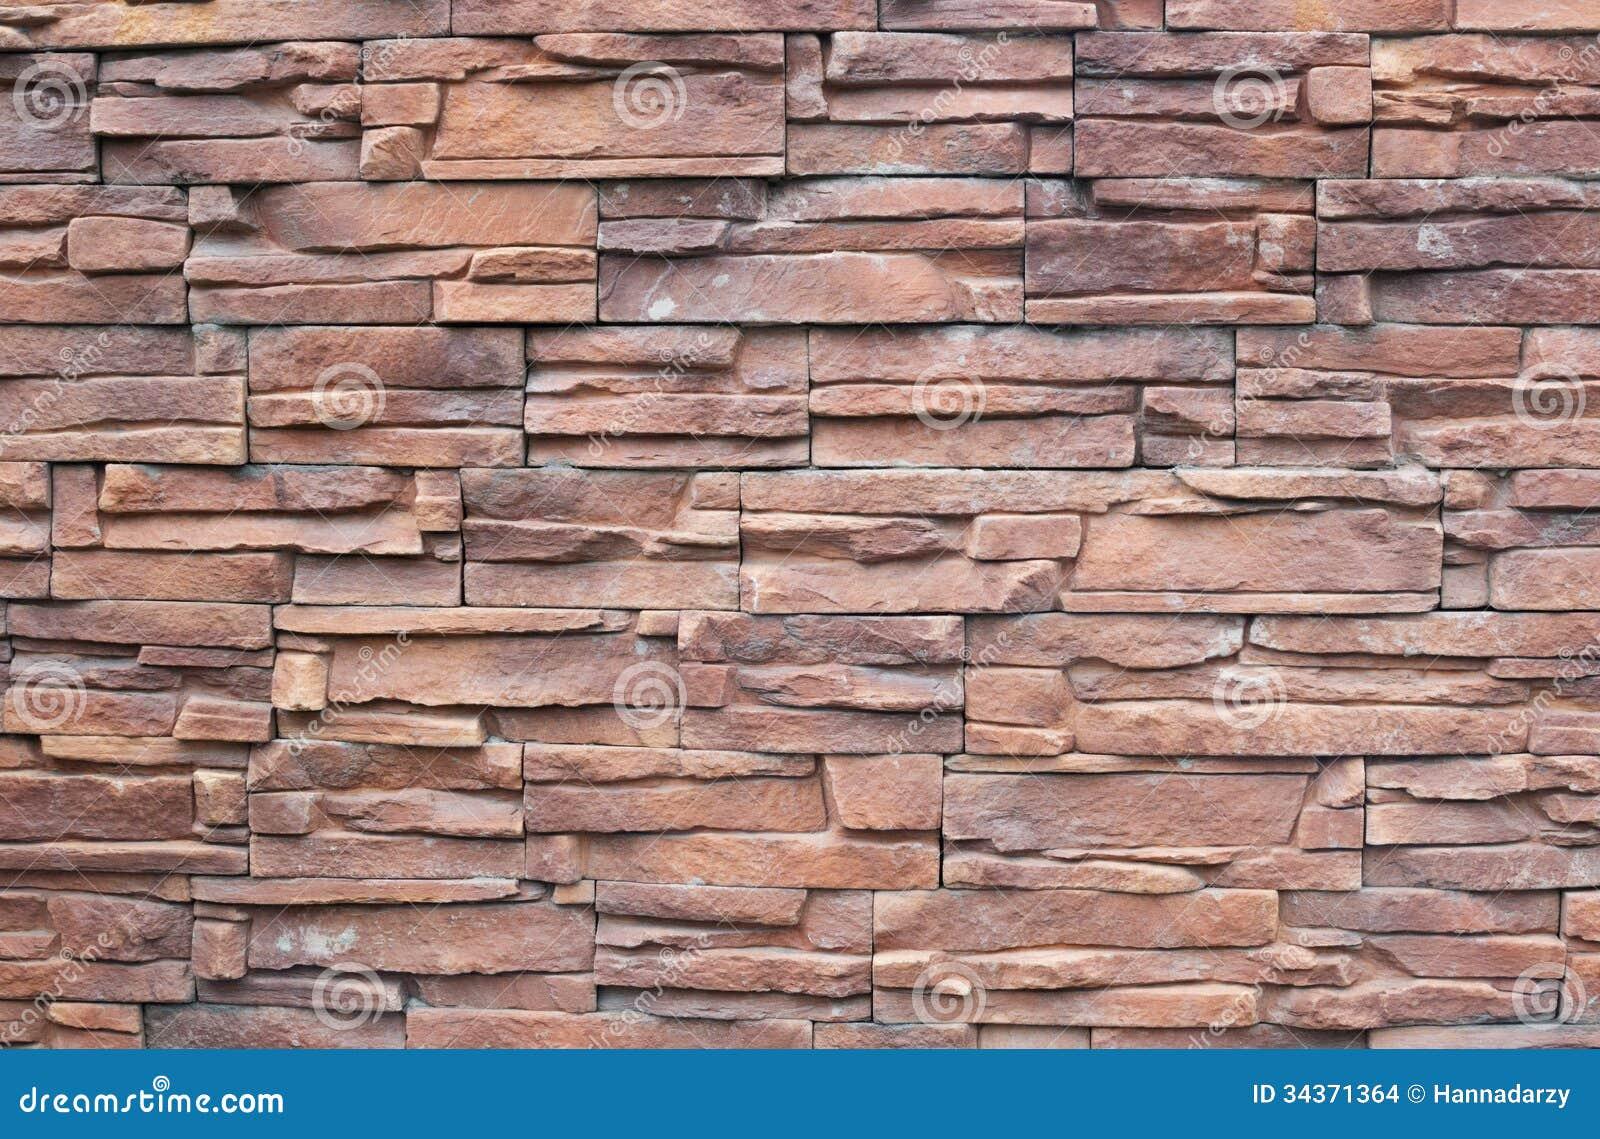 Decorative Wall Stone : Fragment of wall decorative stone stock photo image